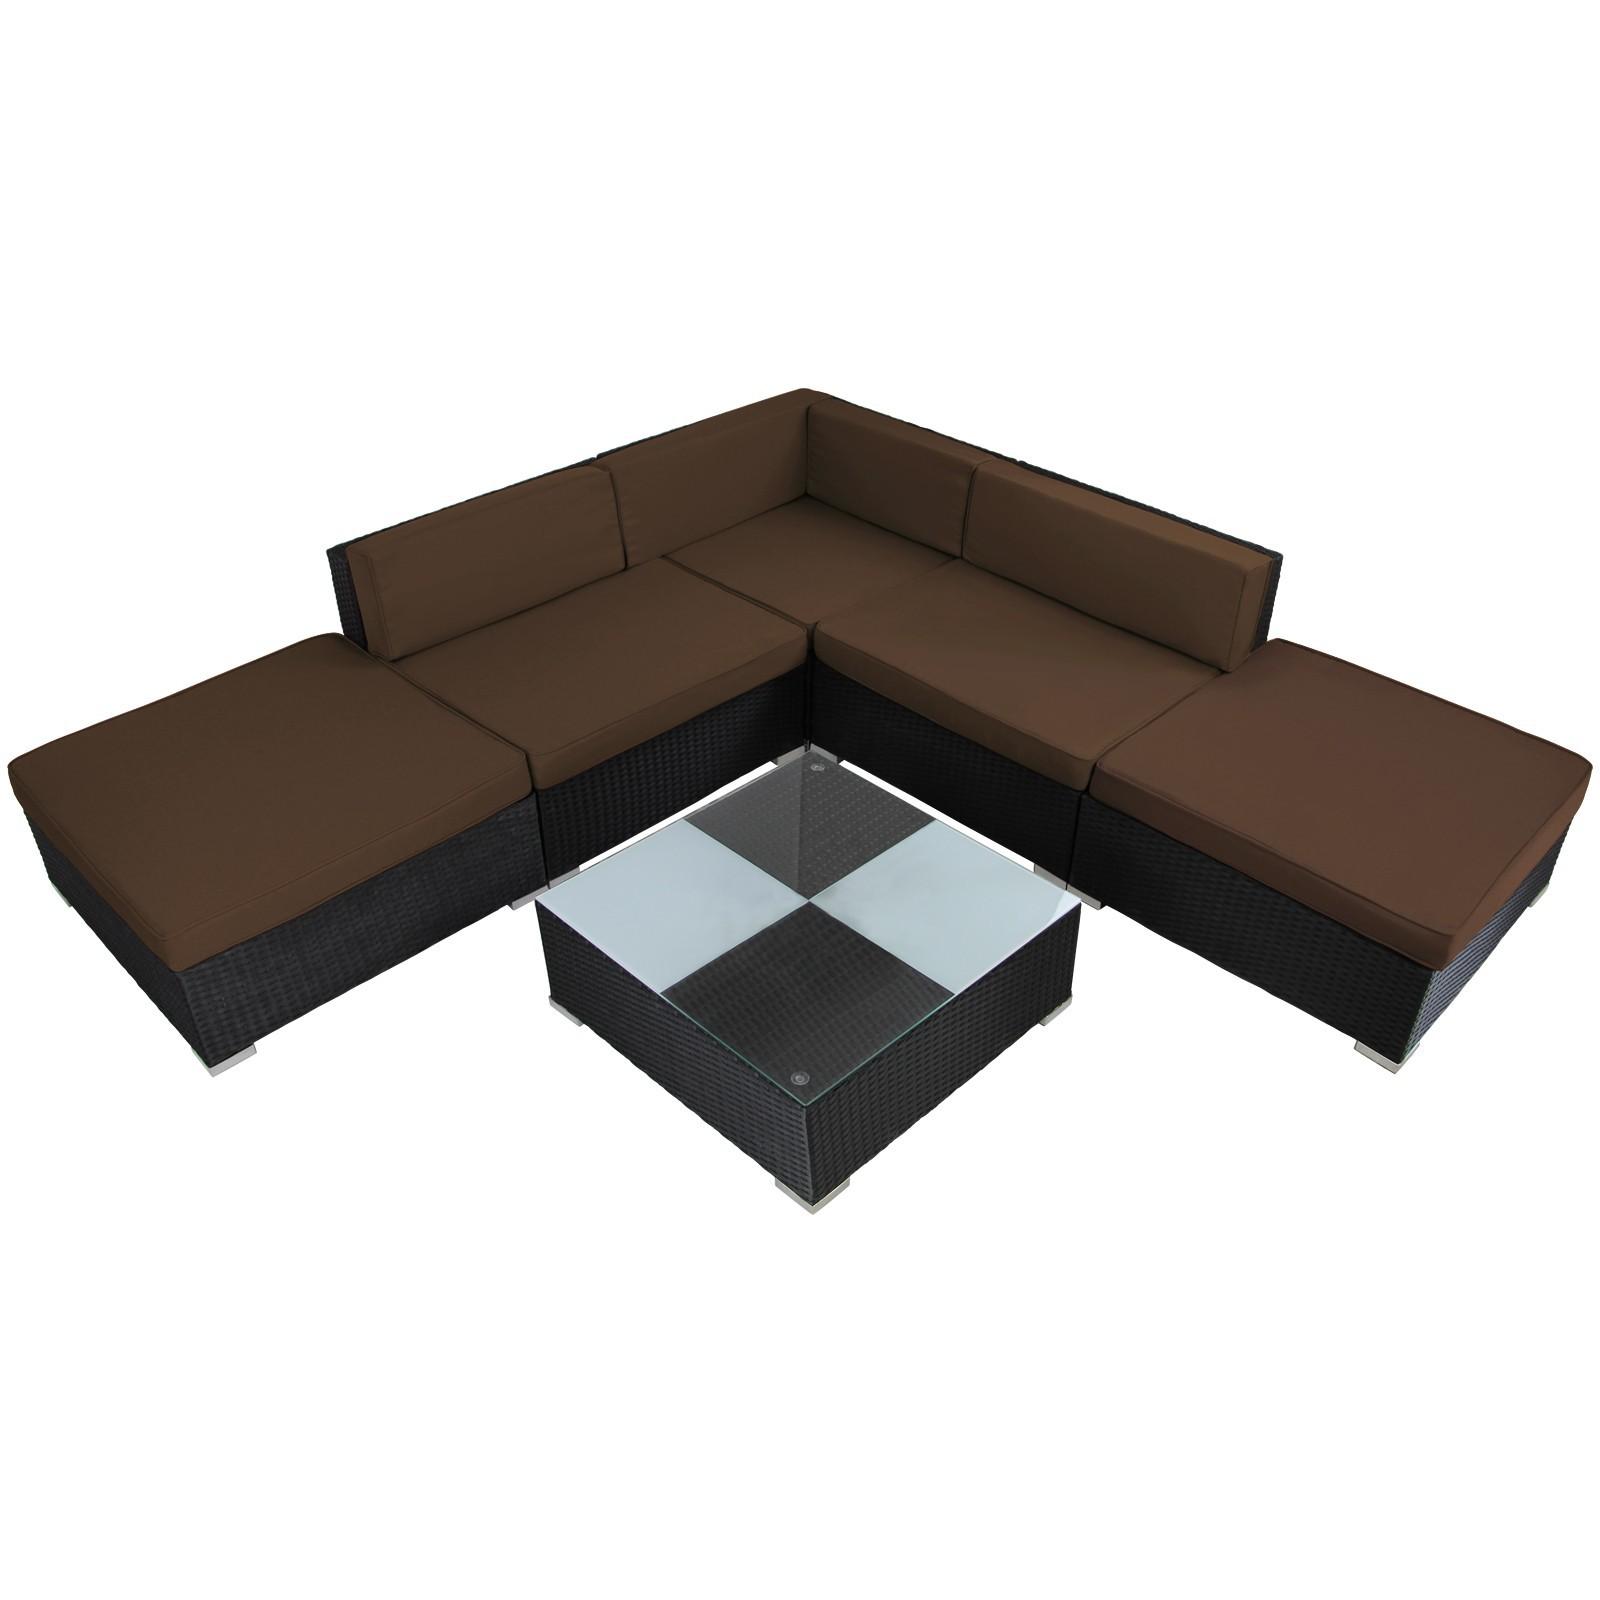 beliani rattan garden lounge - 2 seater sofa - 2 chairs - table ... - Gartenmobel Lounge Polyrattan